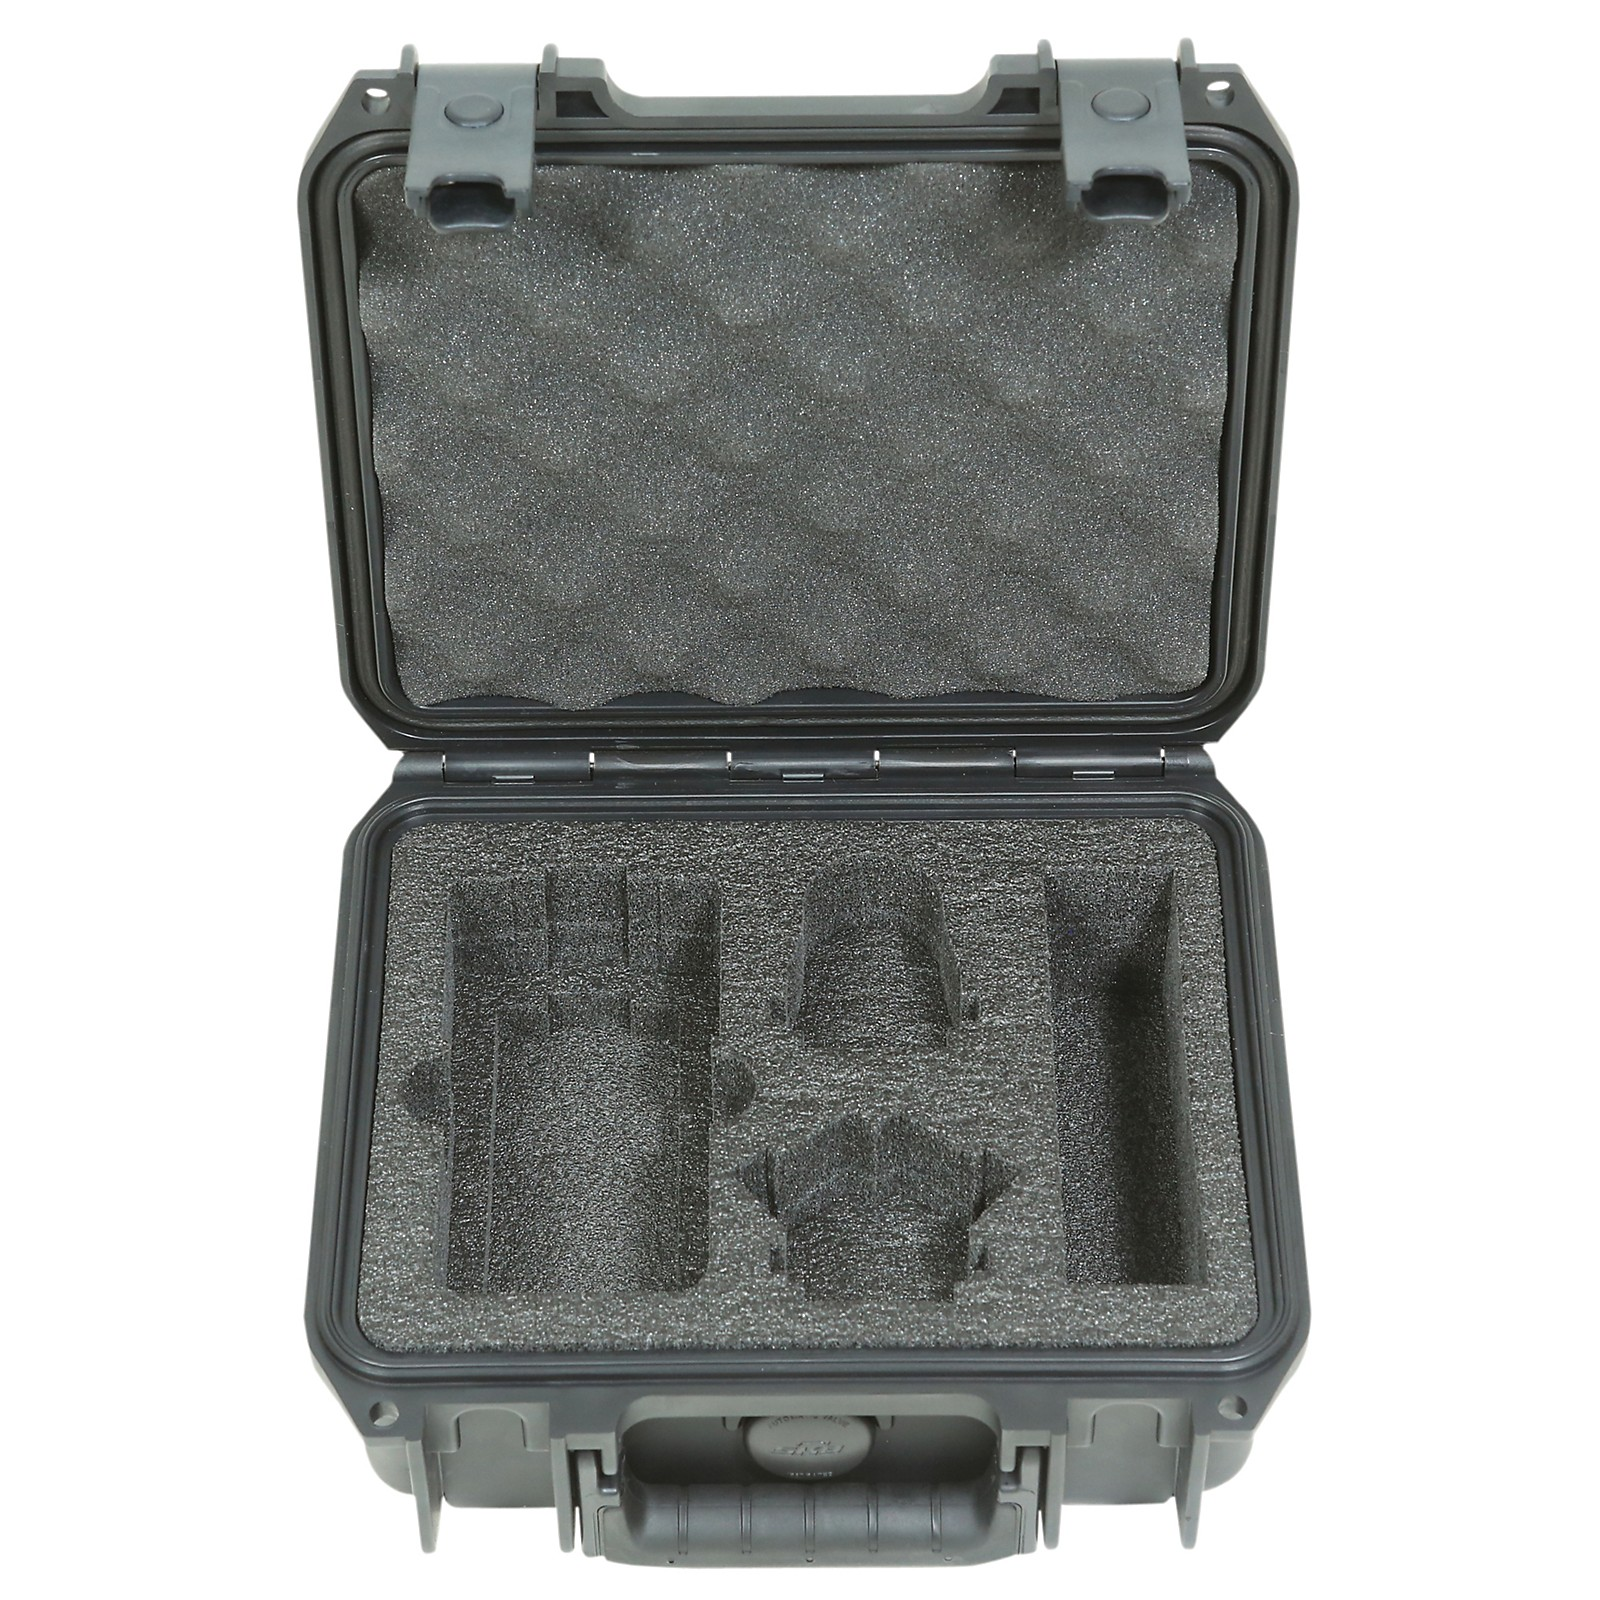 SKB iSeries Case for Zoom H6 Recorder